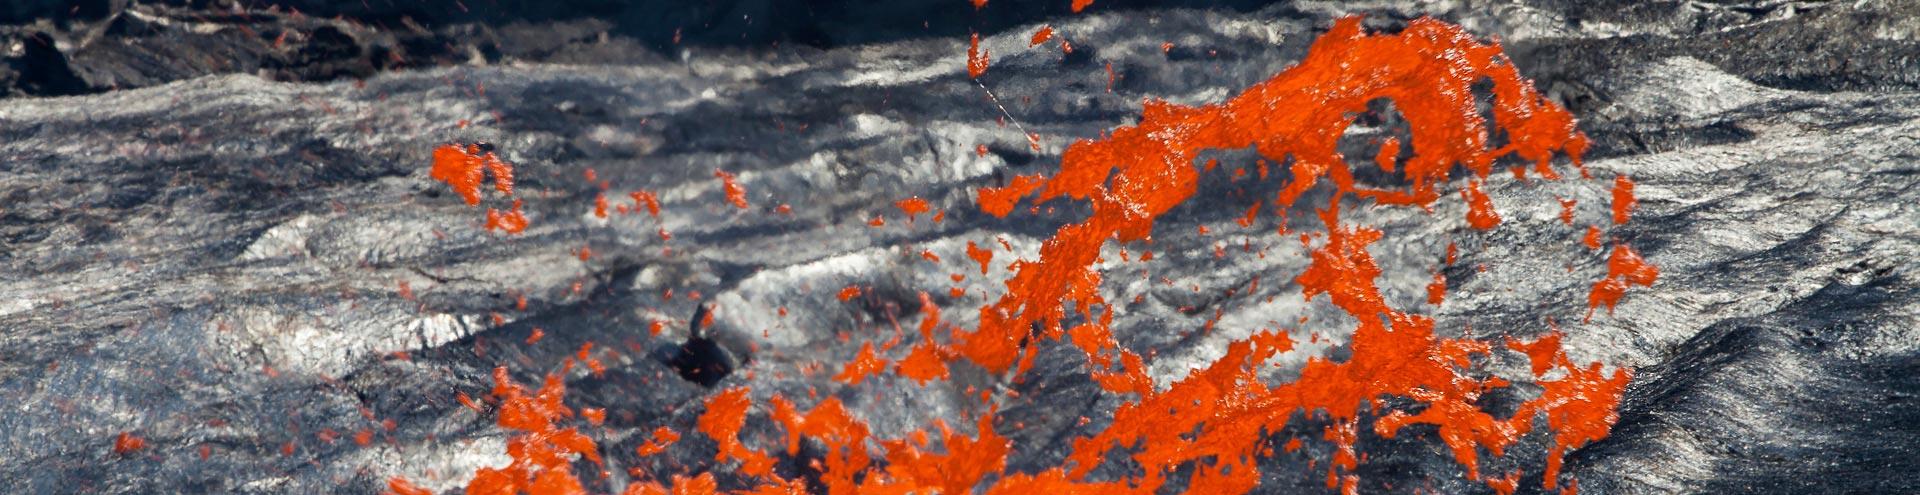 Boiling lava lake